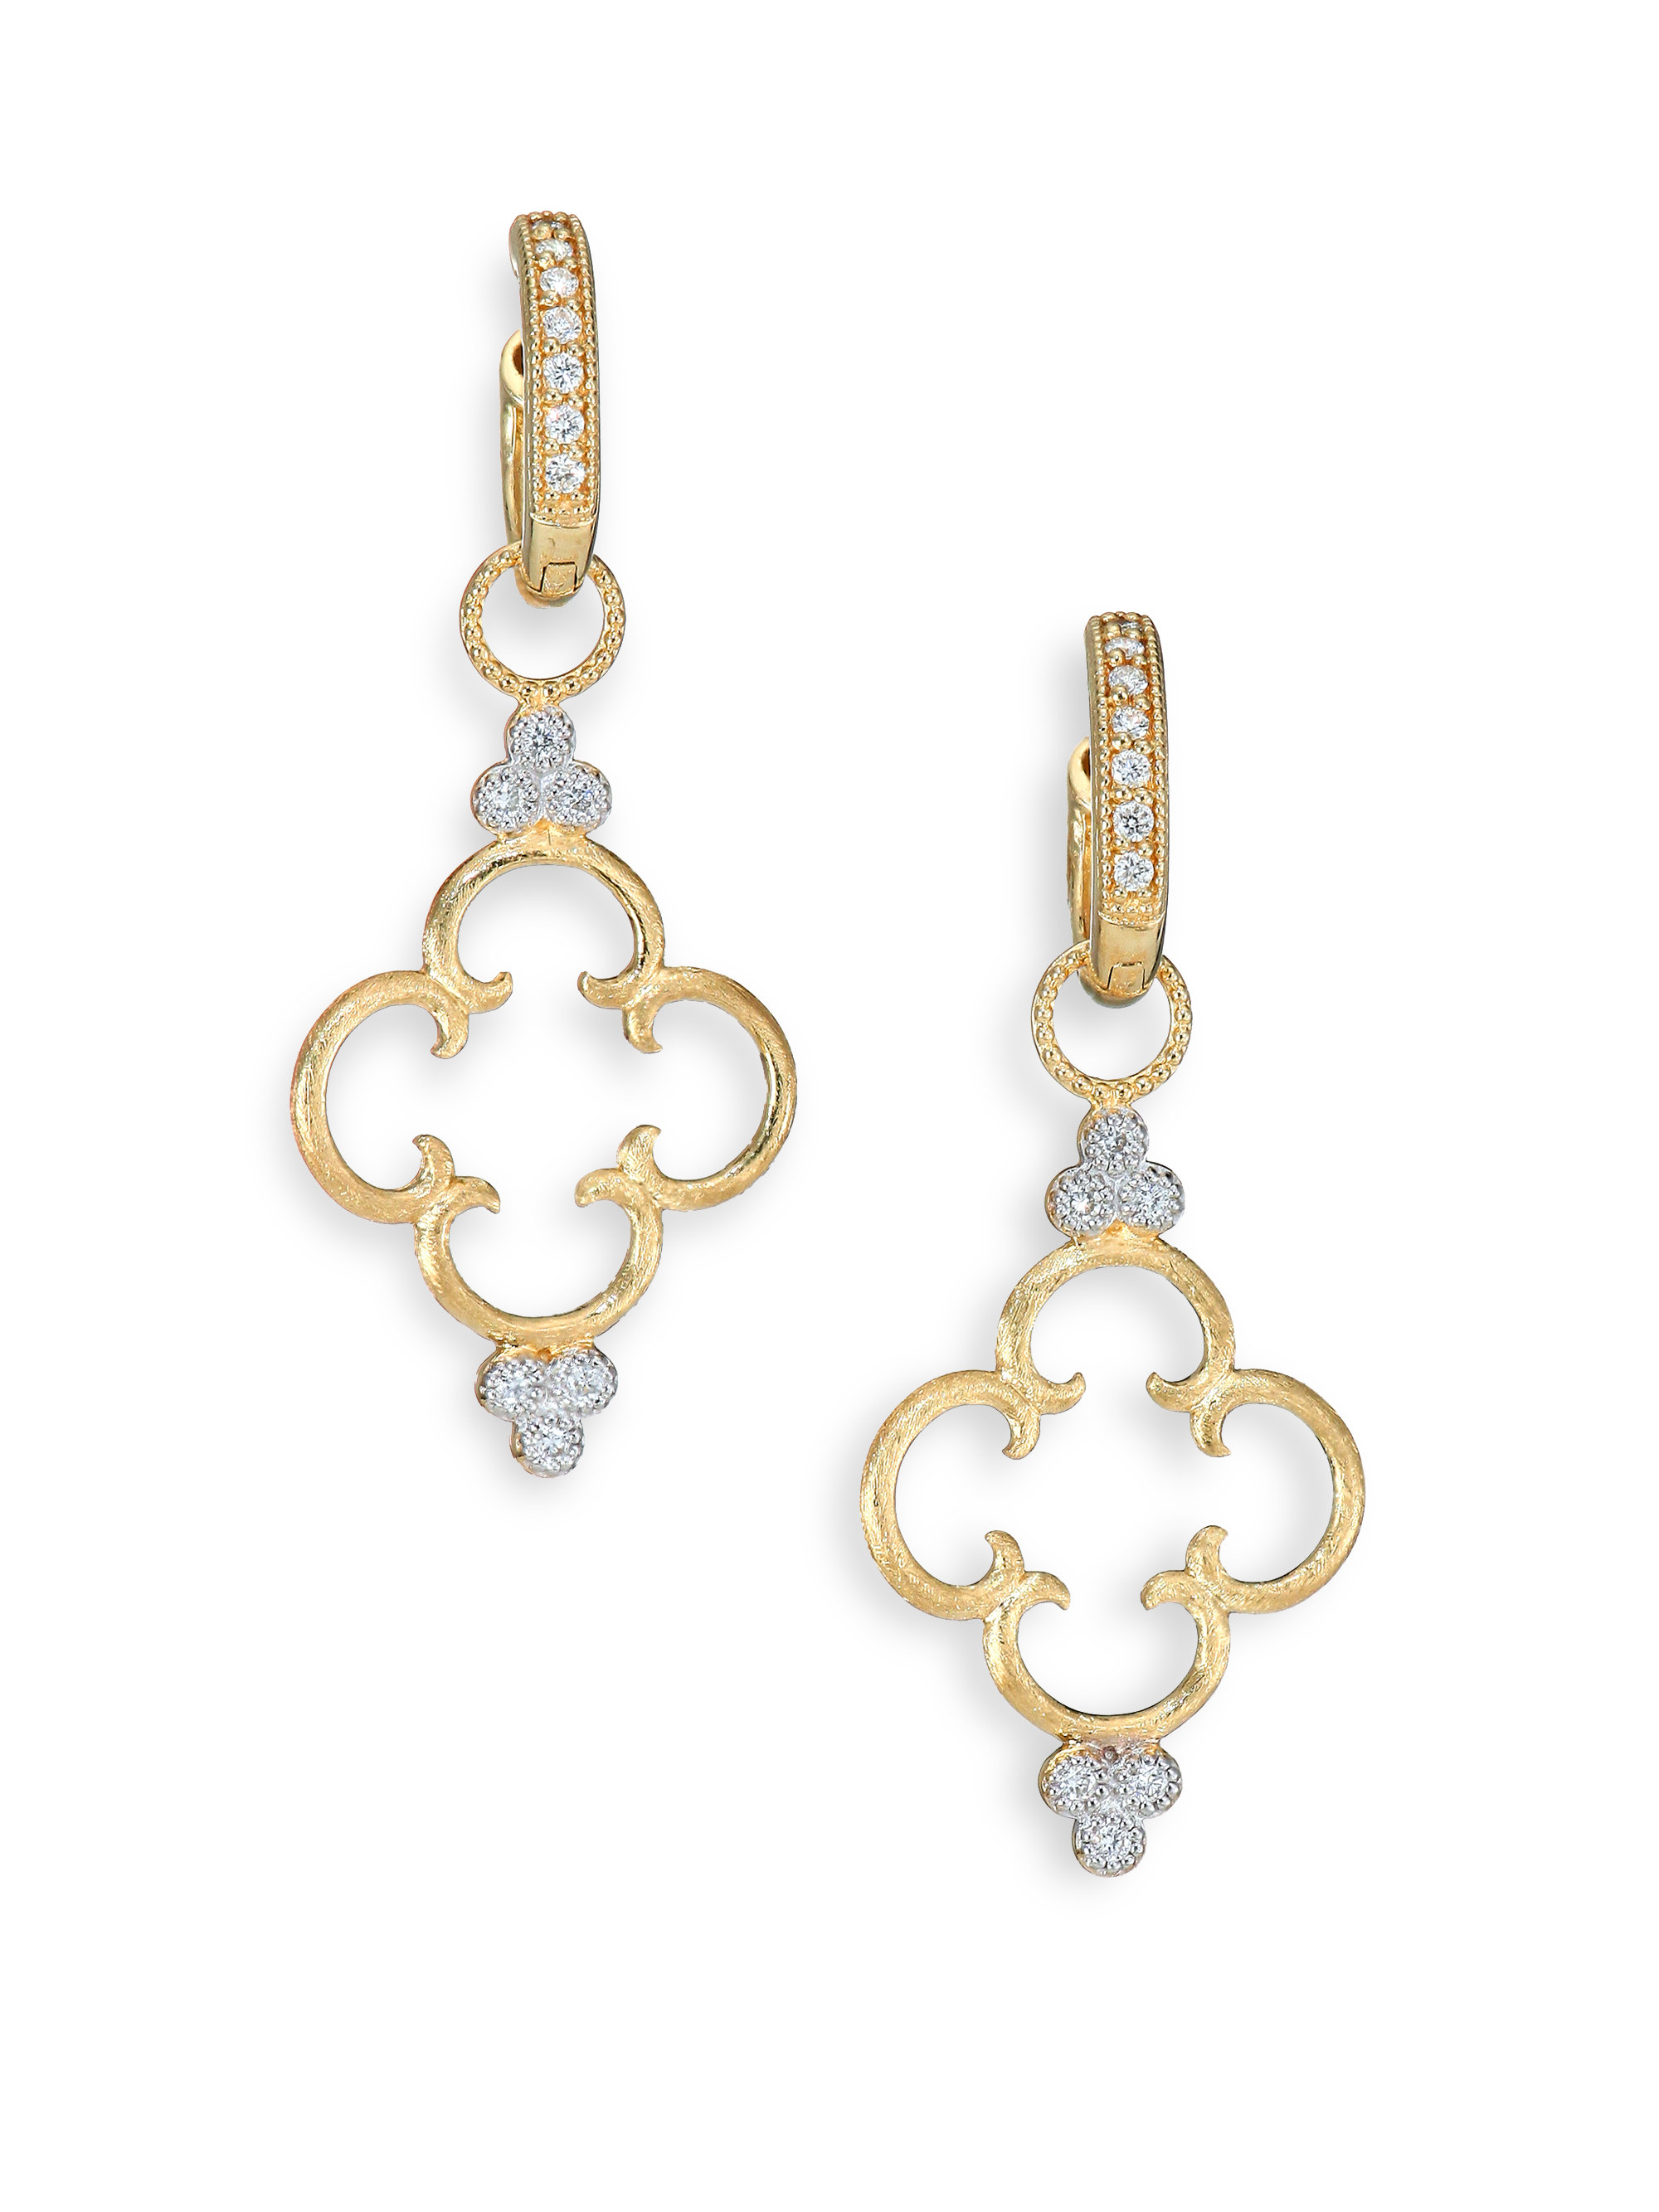 Jude frances Classic Diamond & 18k Yellow Gold Clover